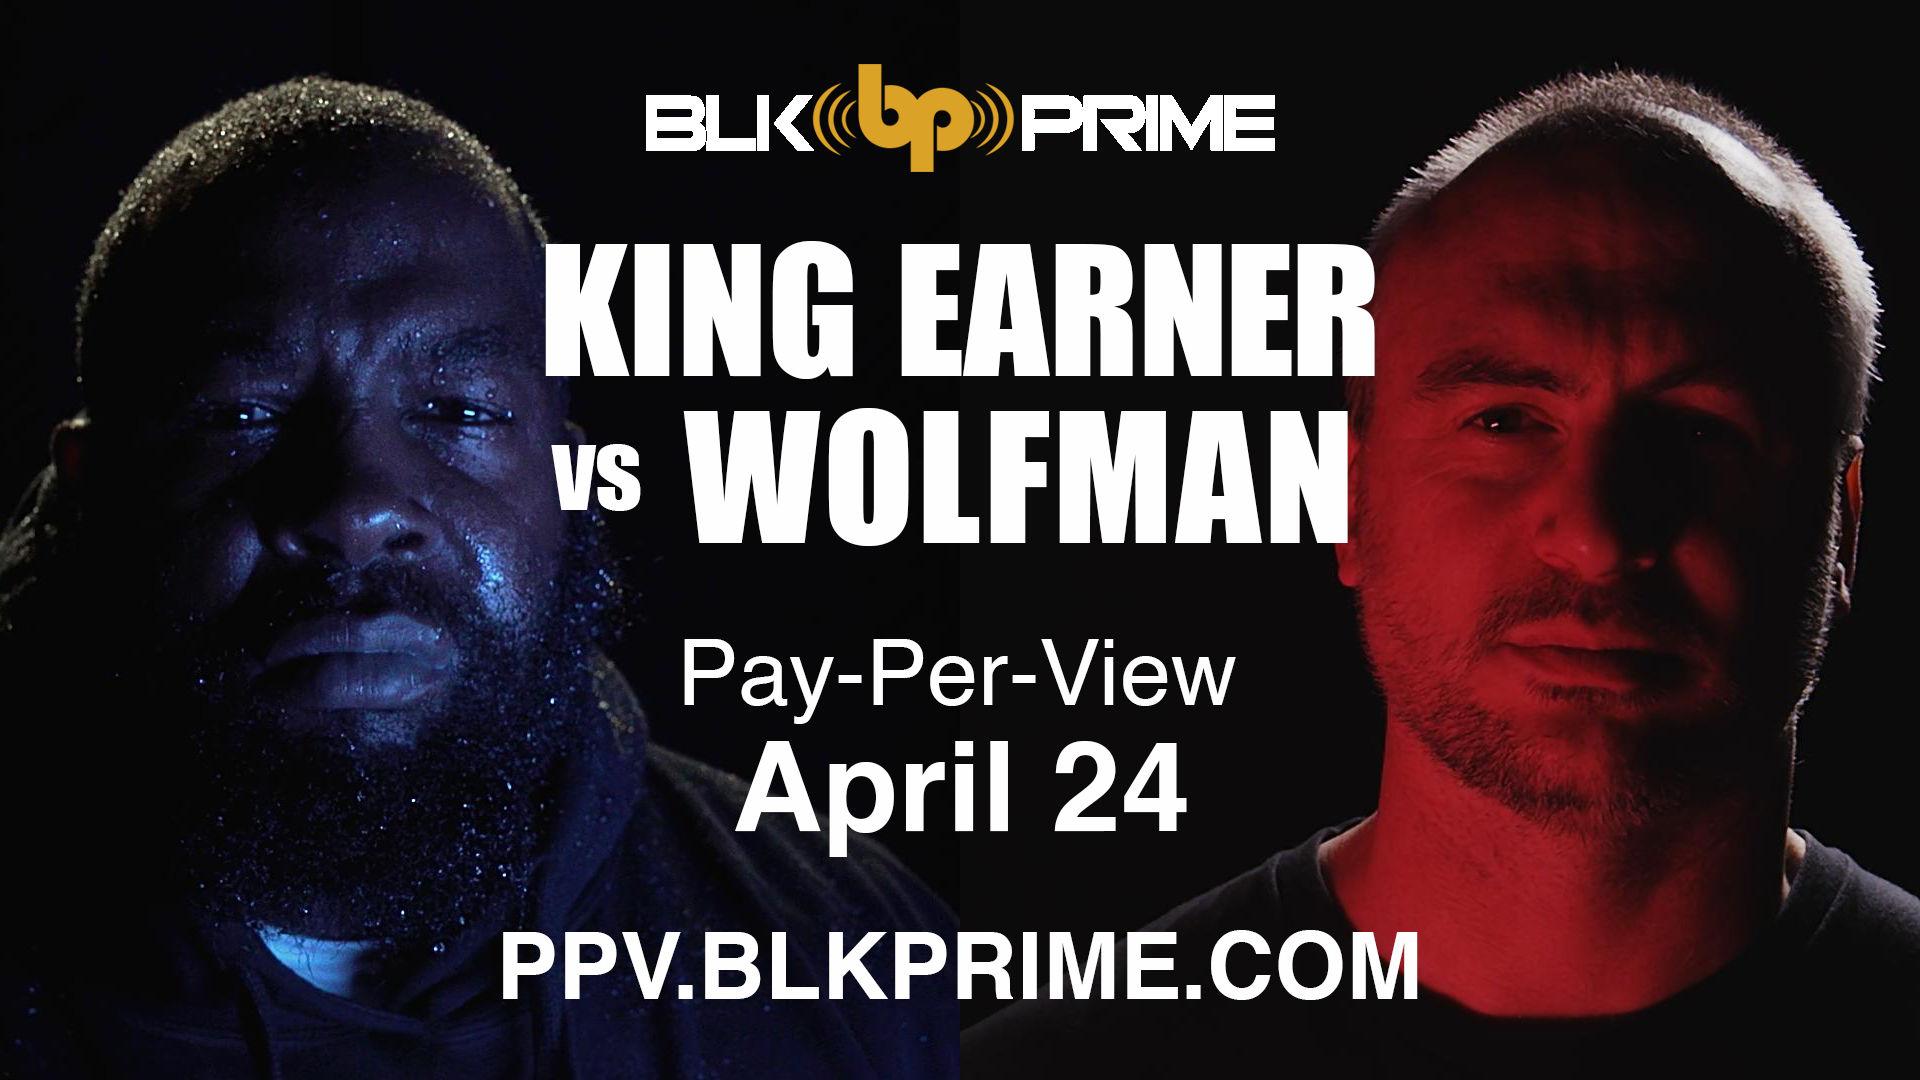 King Earner VS Wolfman